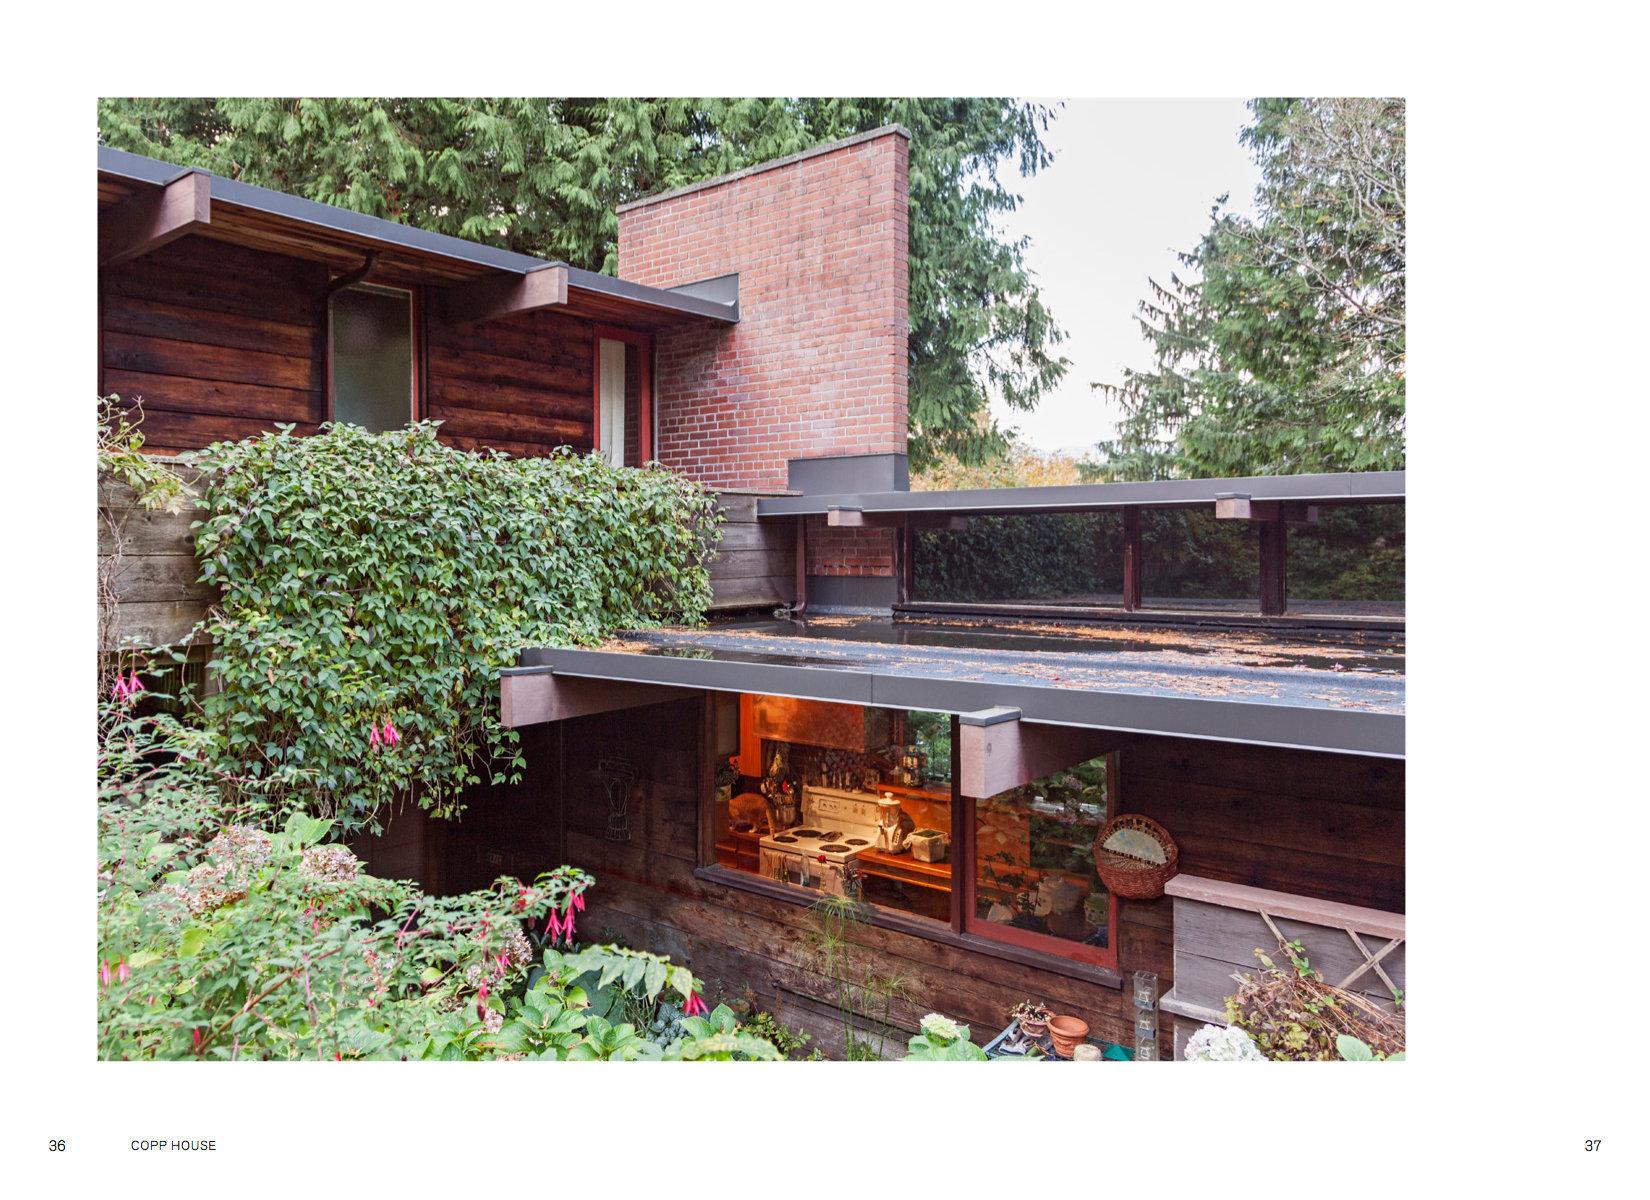 36-37 Copp House.jpg